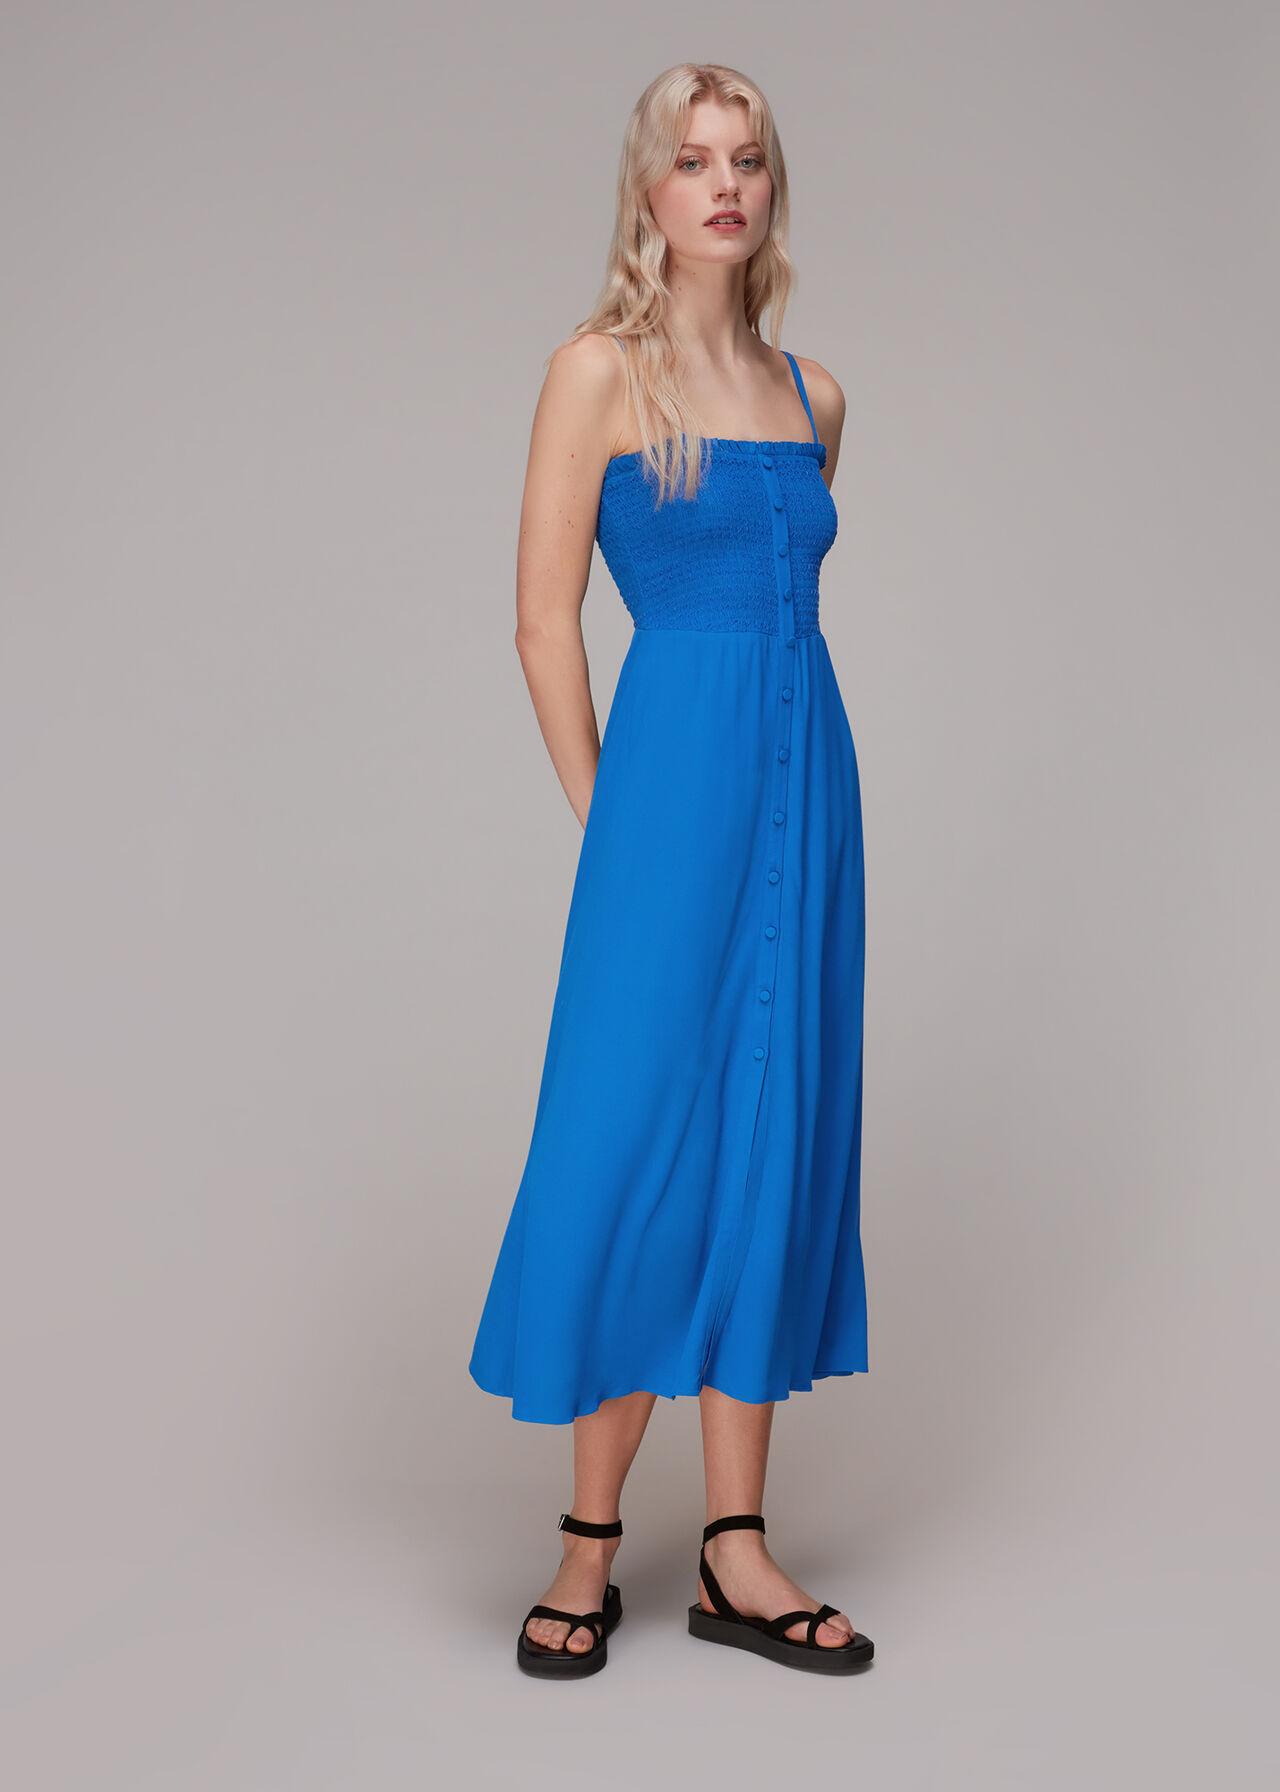 Gracia Smocked Dress Blue